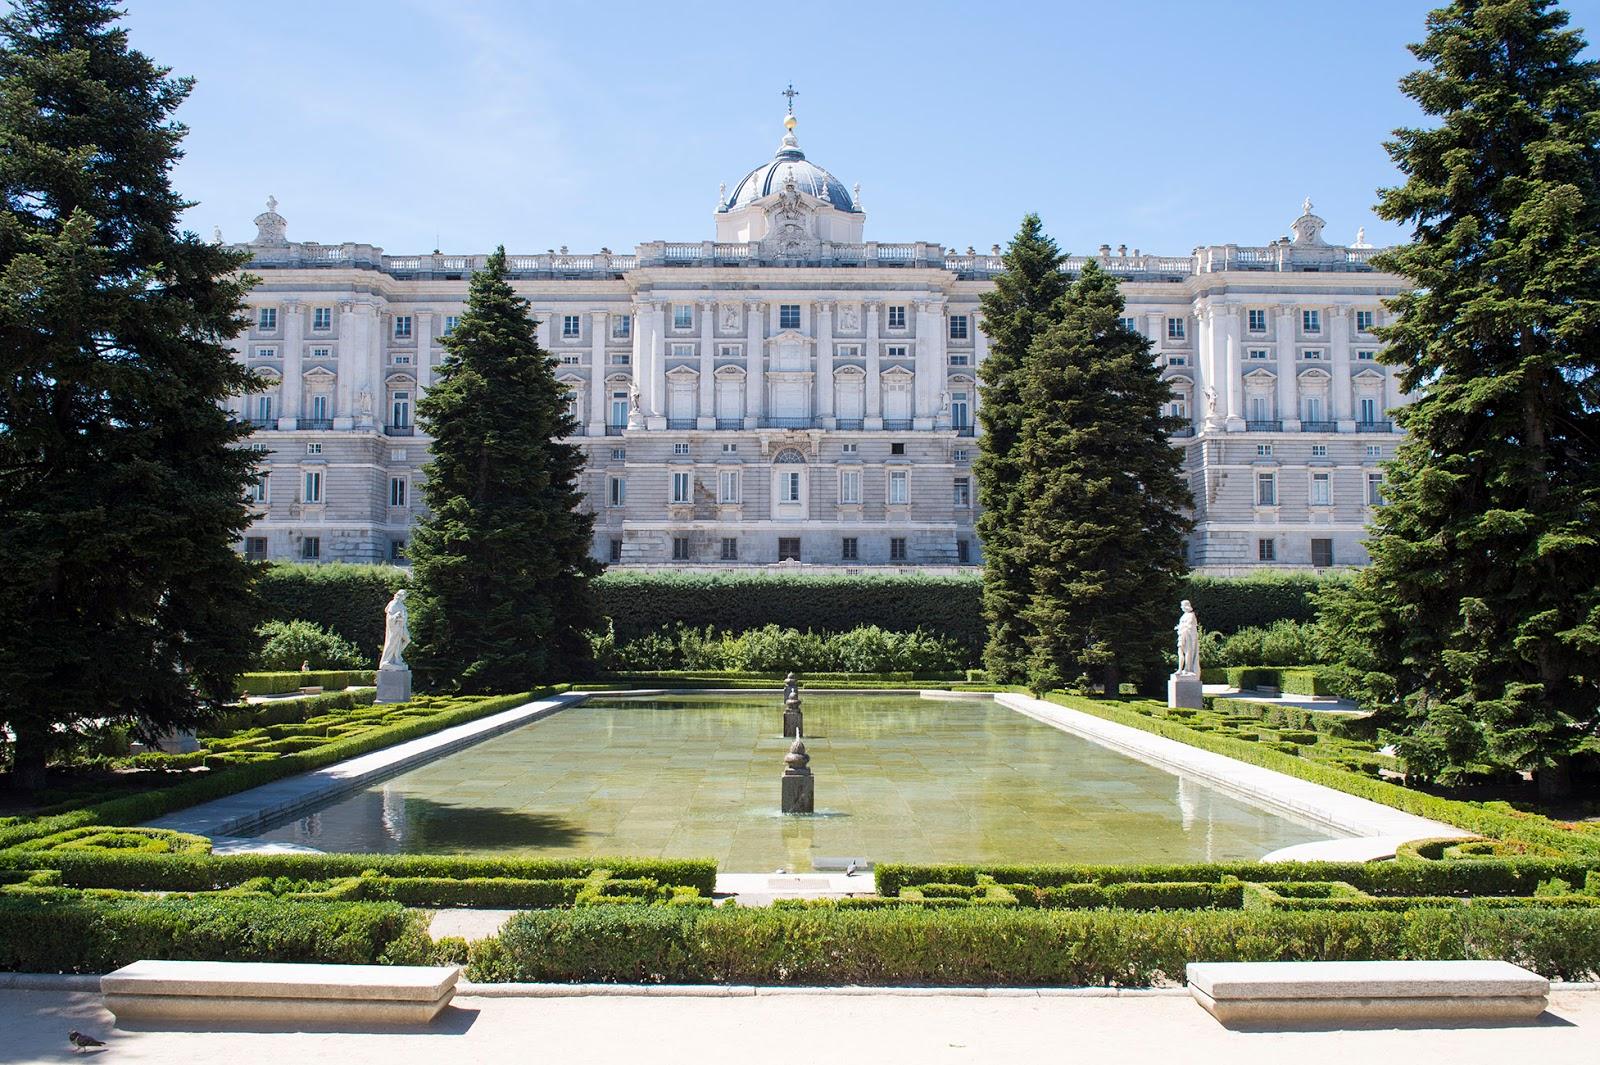 royal palace sabatini gardens madrid spain